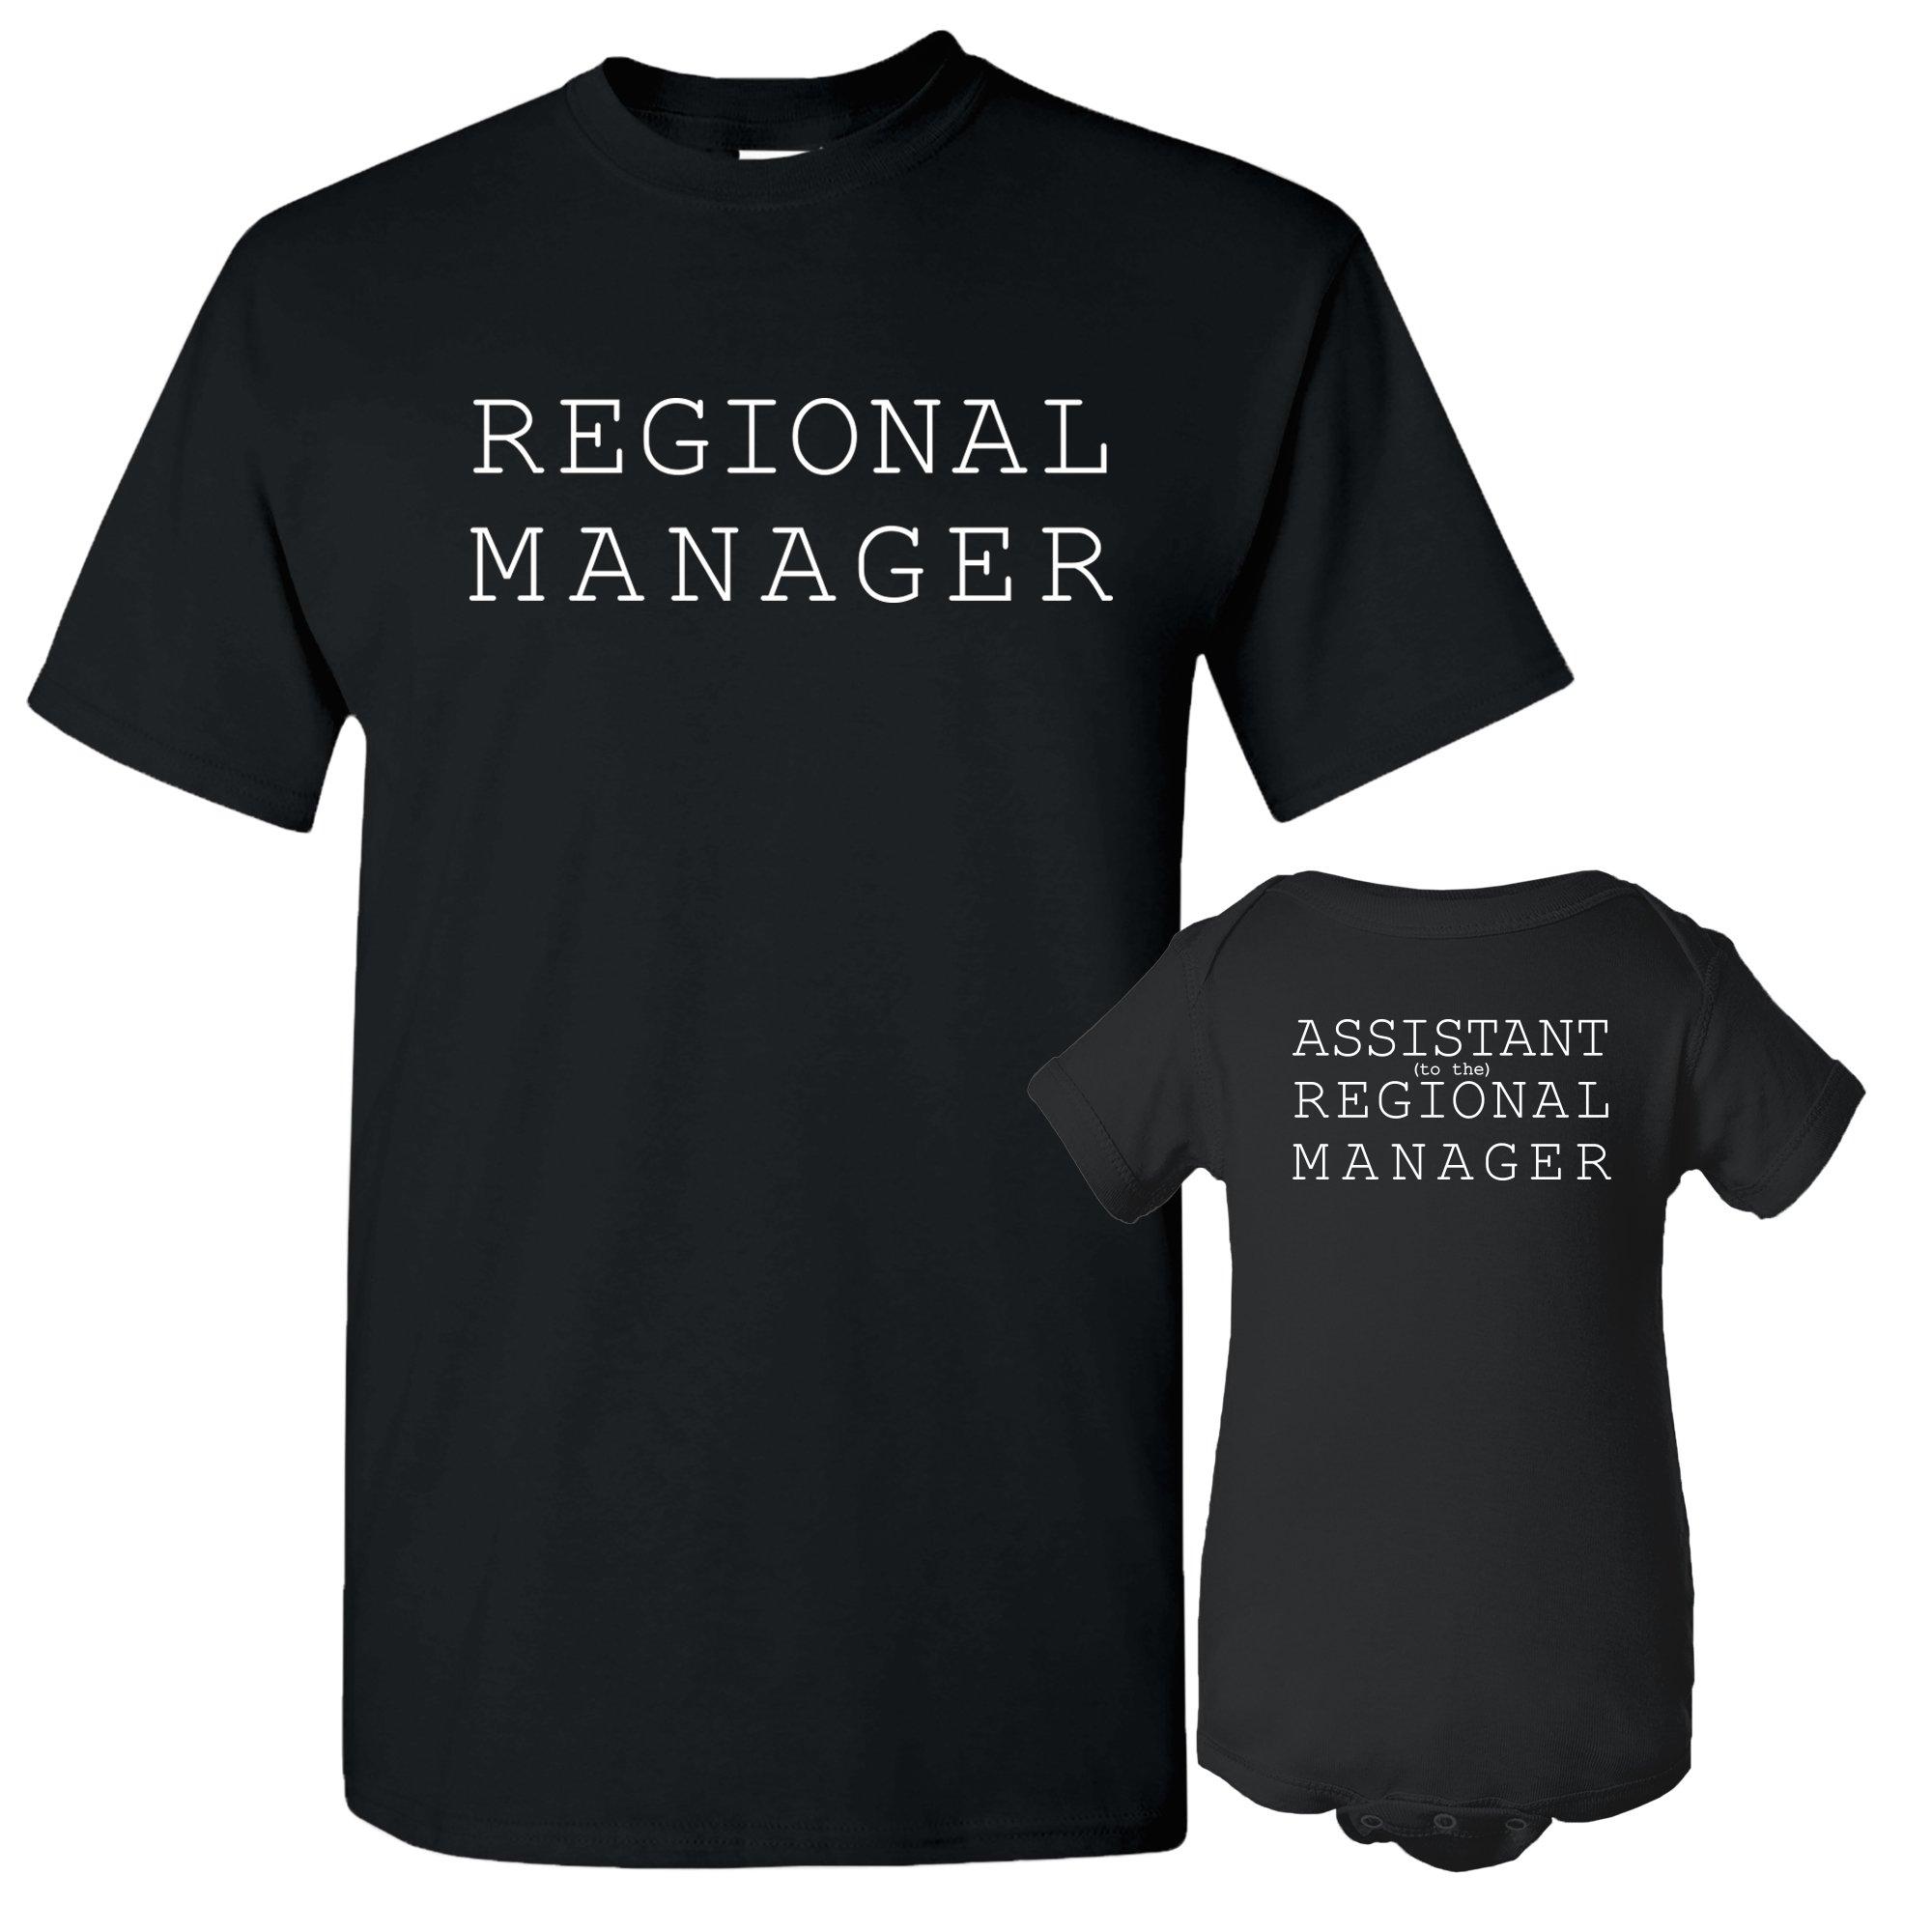 UGP Campus Apparel Regional Manager, Assistant Regional Manager - Funny Office Adult T Shirt & Infant Onesie Bundle - Black - Adult XL/Newborn